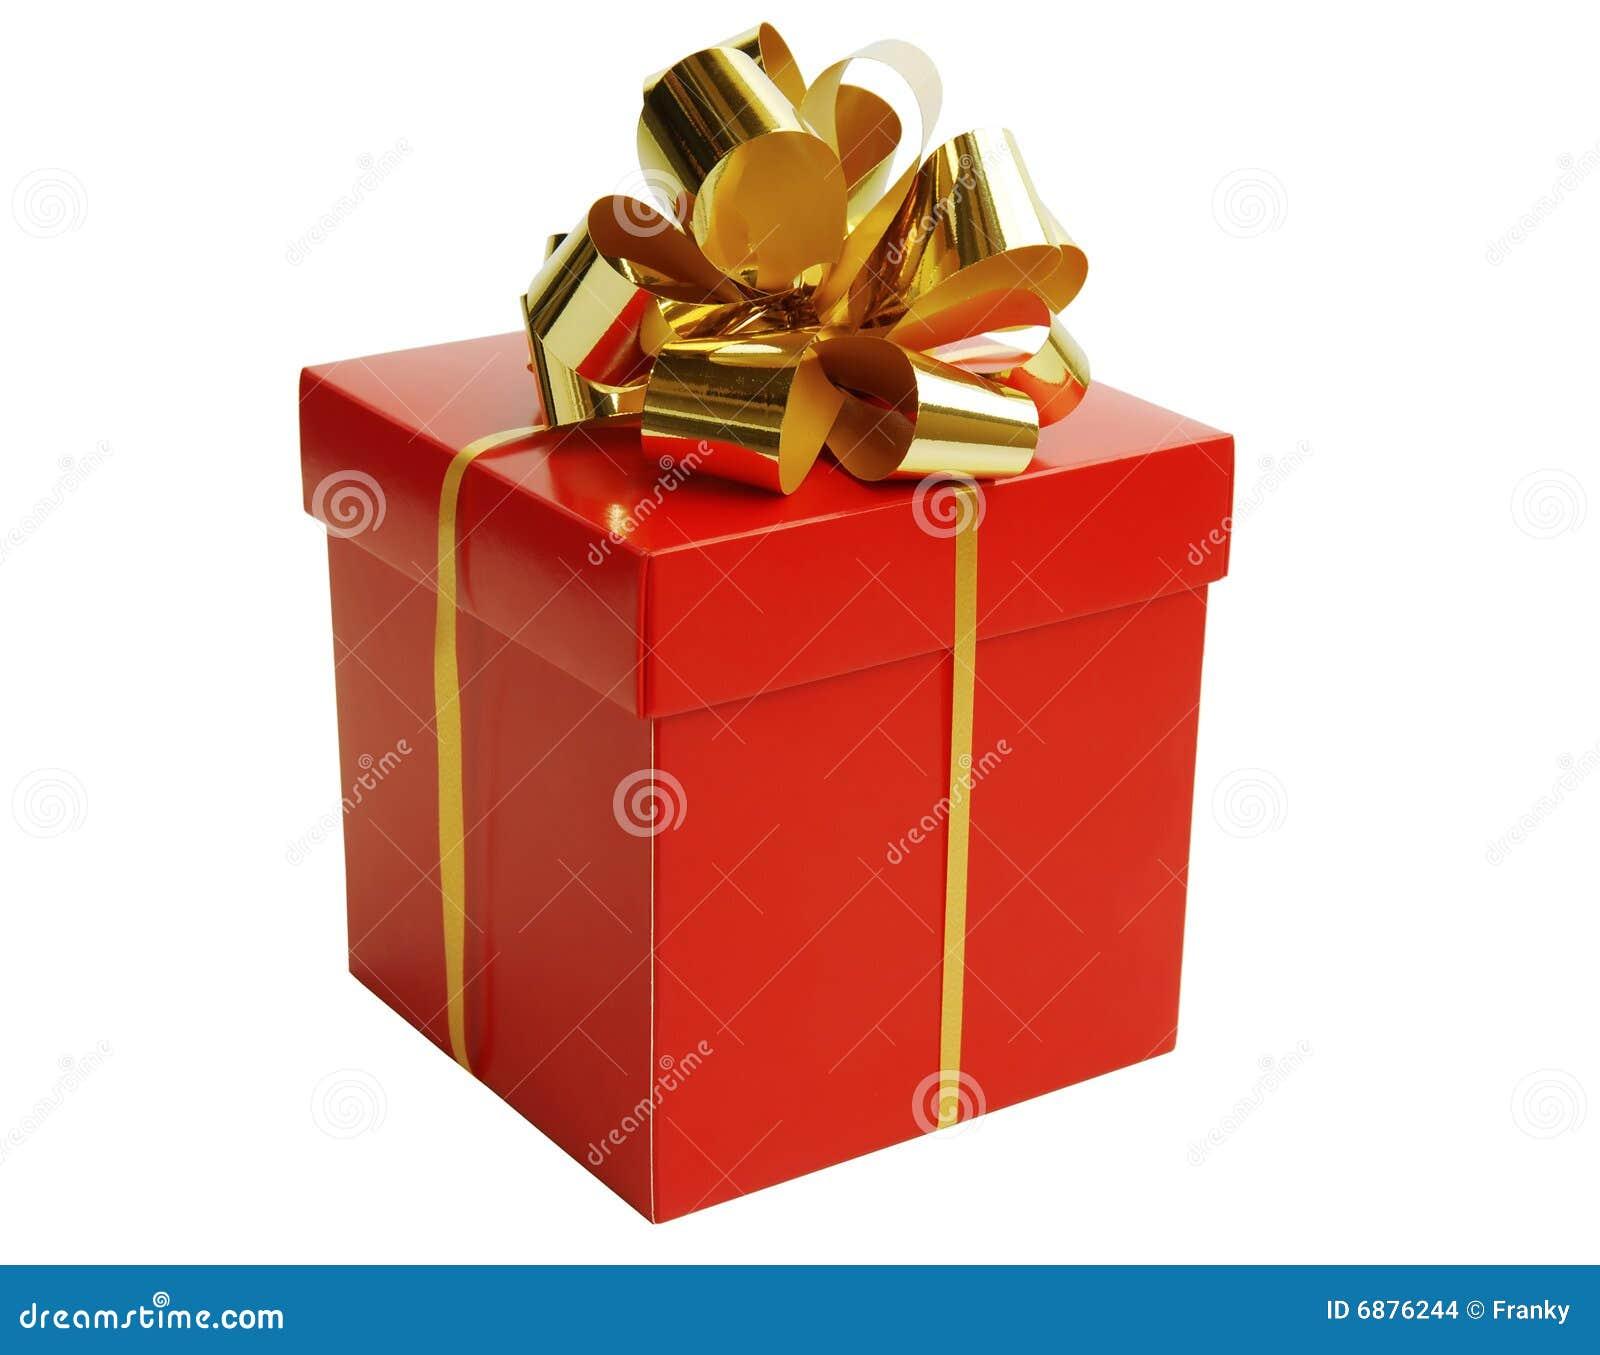 Подарки за покупку от 399 руб